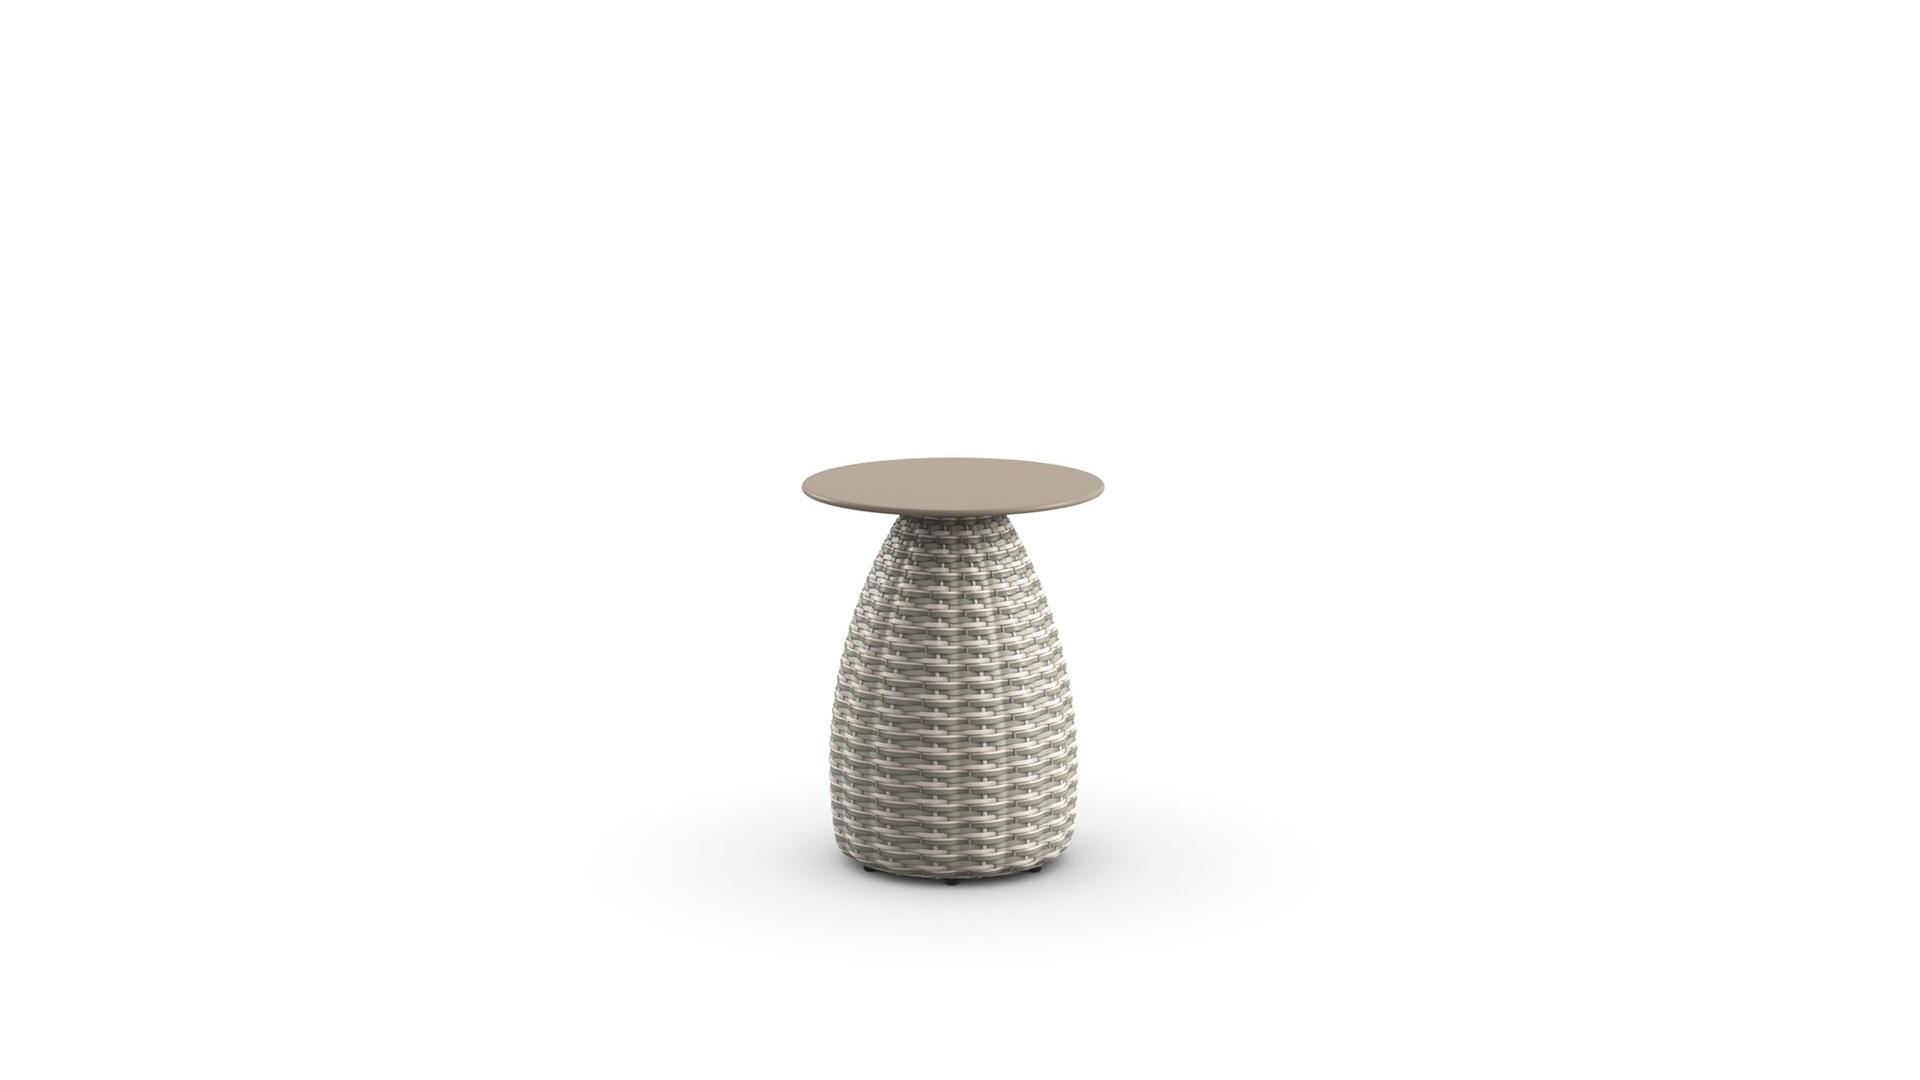 DEDON-Porcini-Side-table-41-carrara.jpg